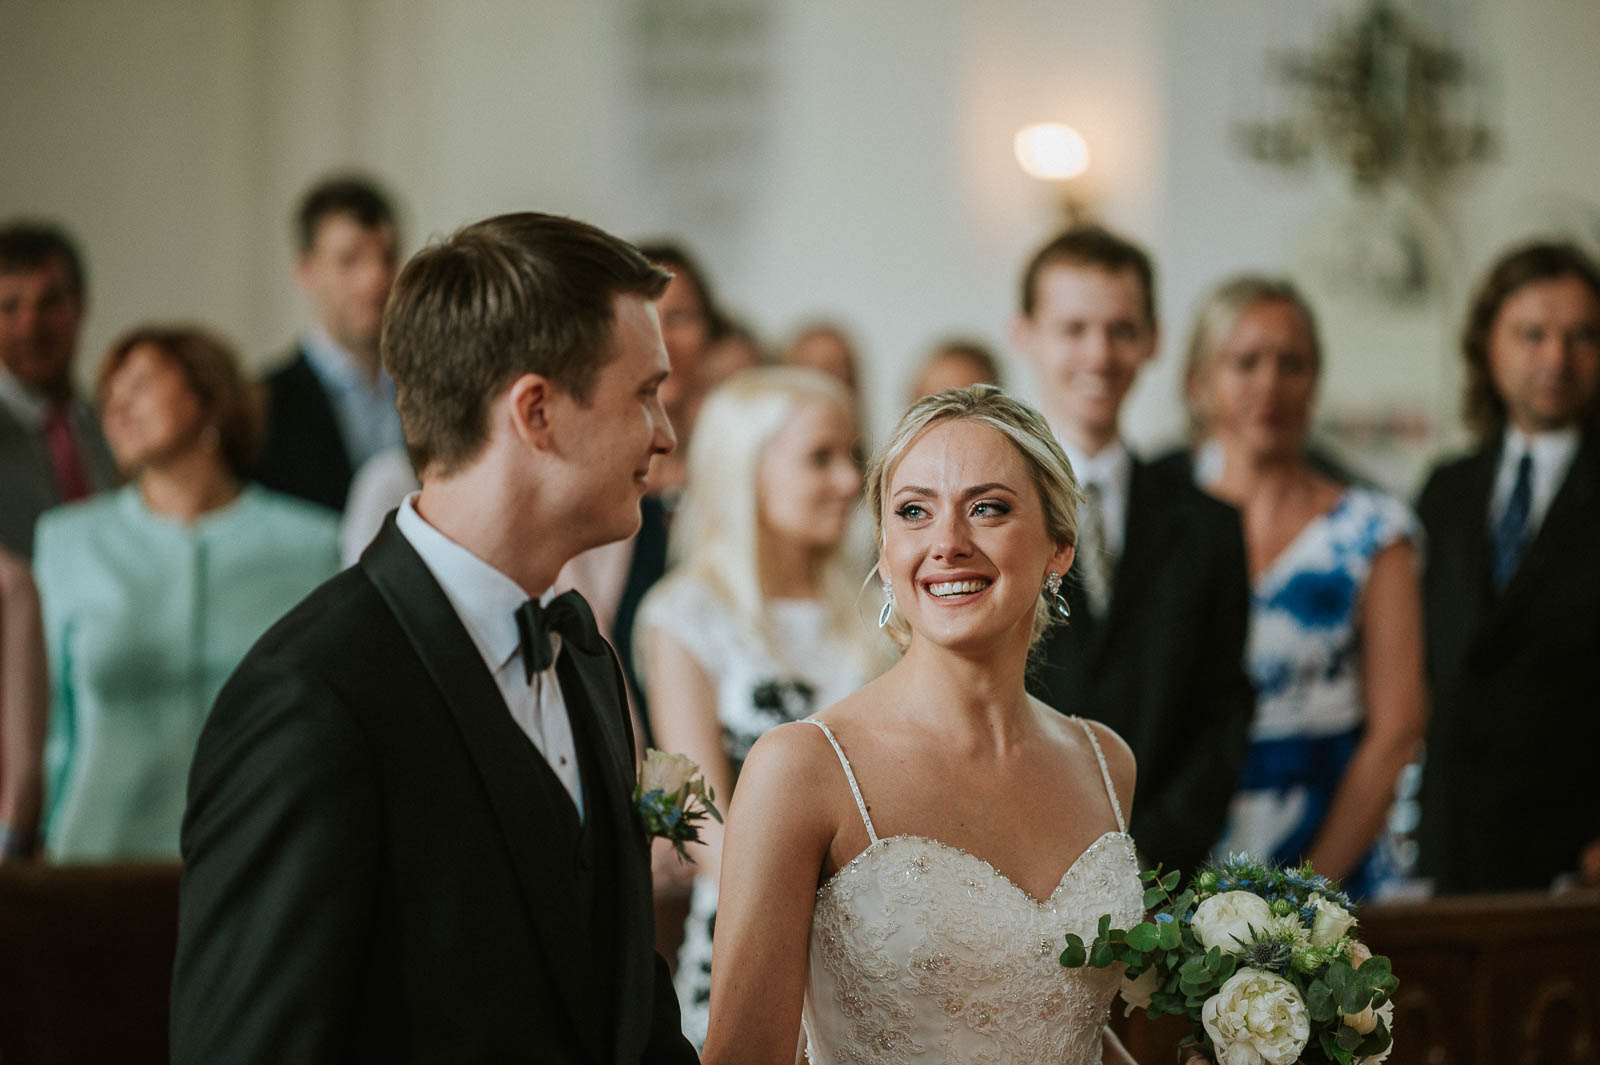 Liisa-Andreas-pulm-padise-mois-manor-040